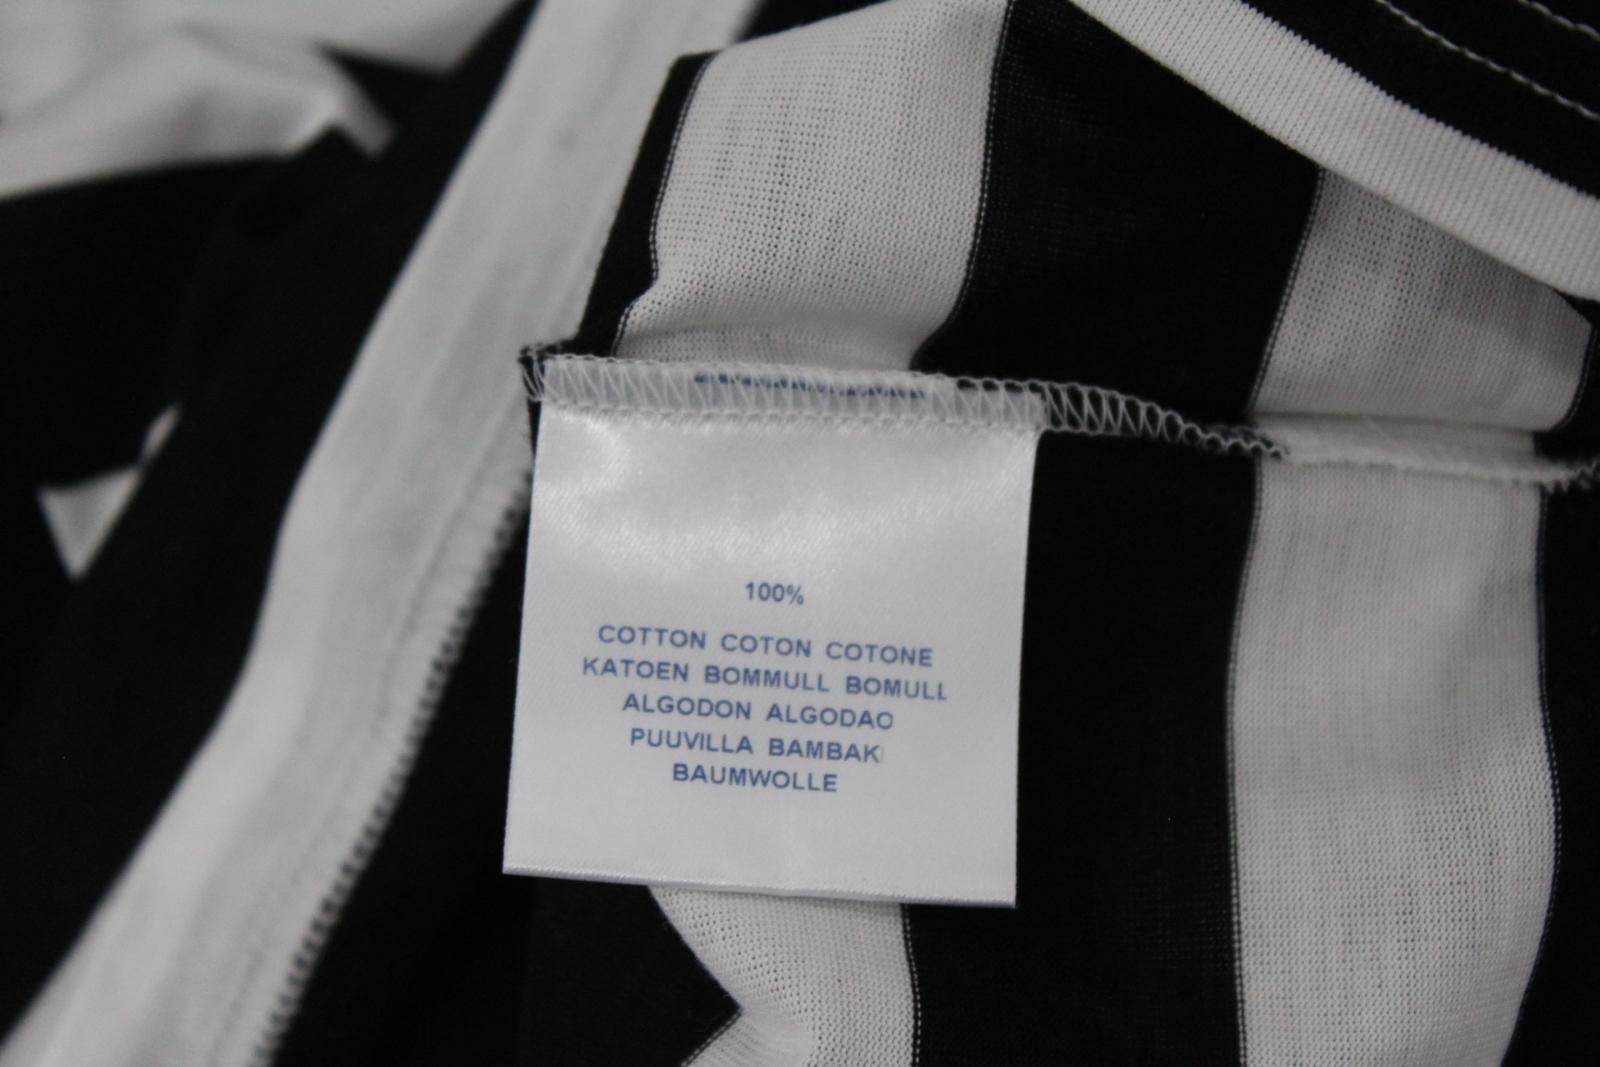 BURBERRY-GOLF-Ladies-Black-White-Cotton-Short-Sleeve-Striped-Polo-Shirt-S-BNWT thumbnail 10